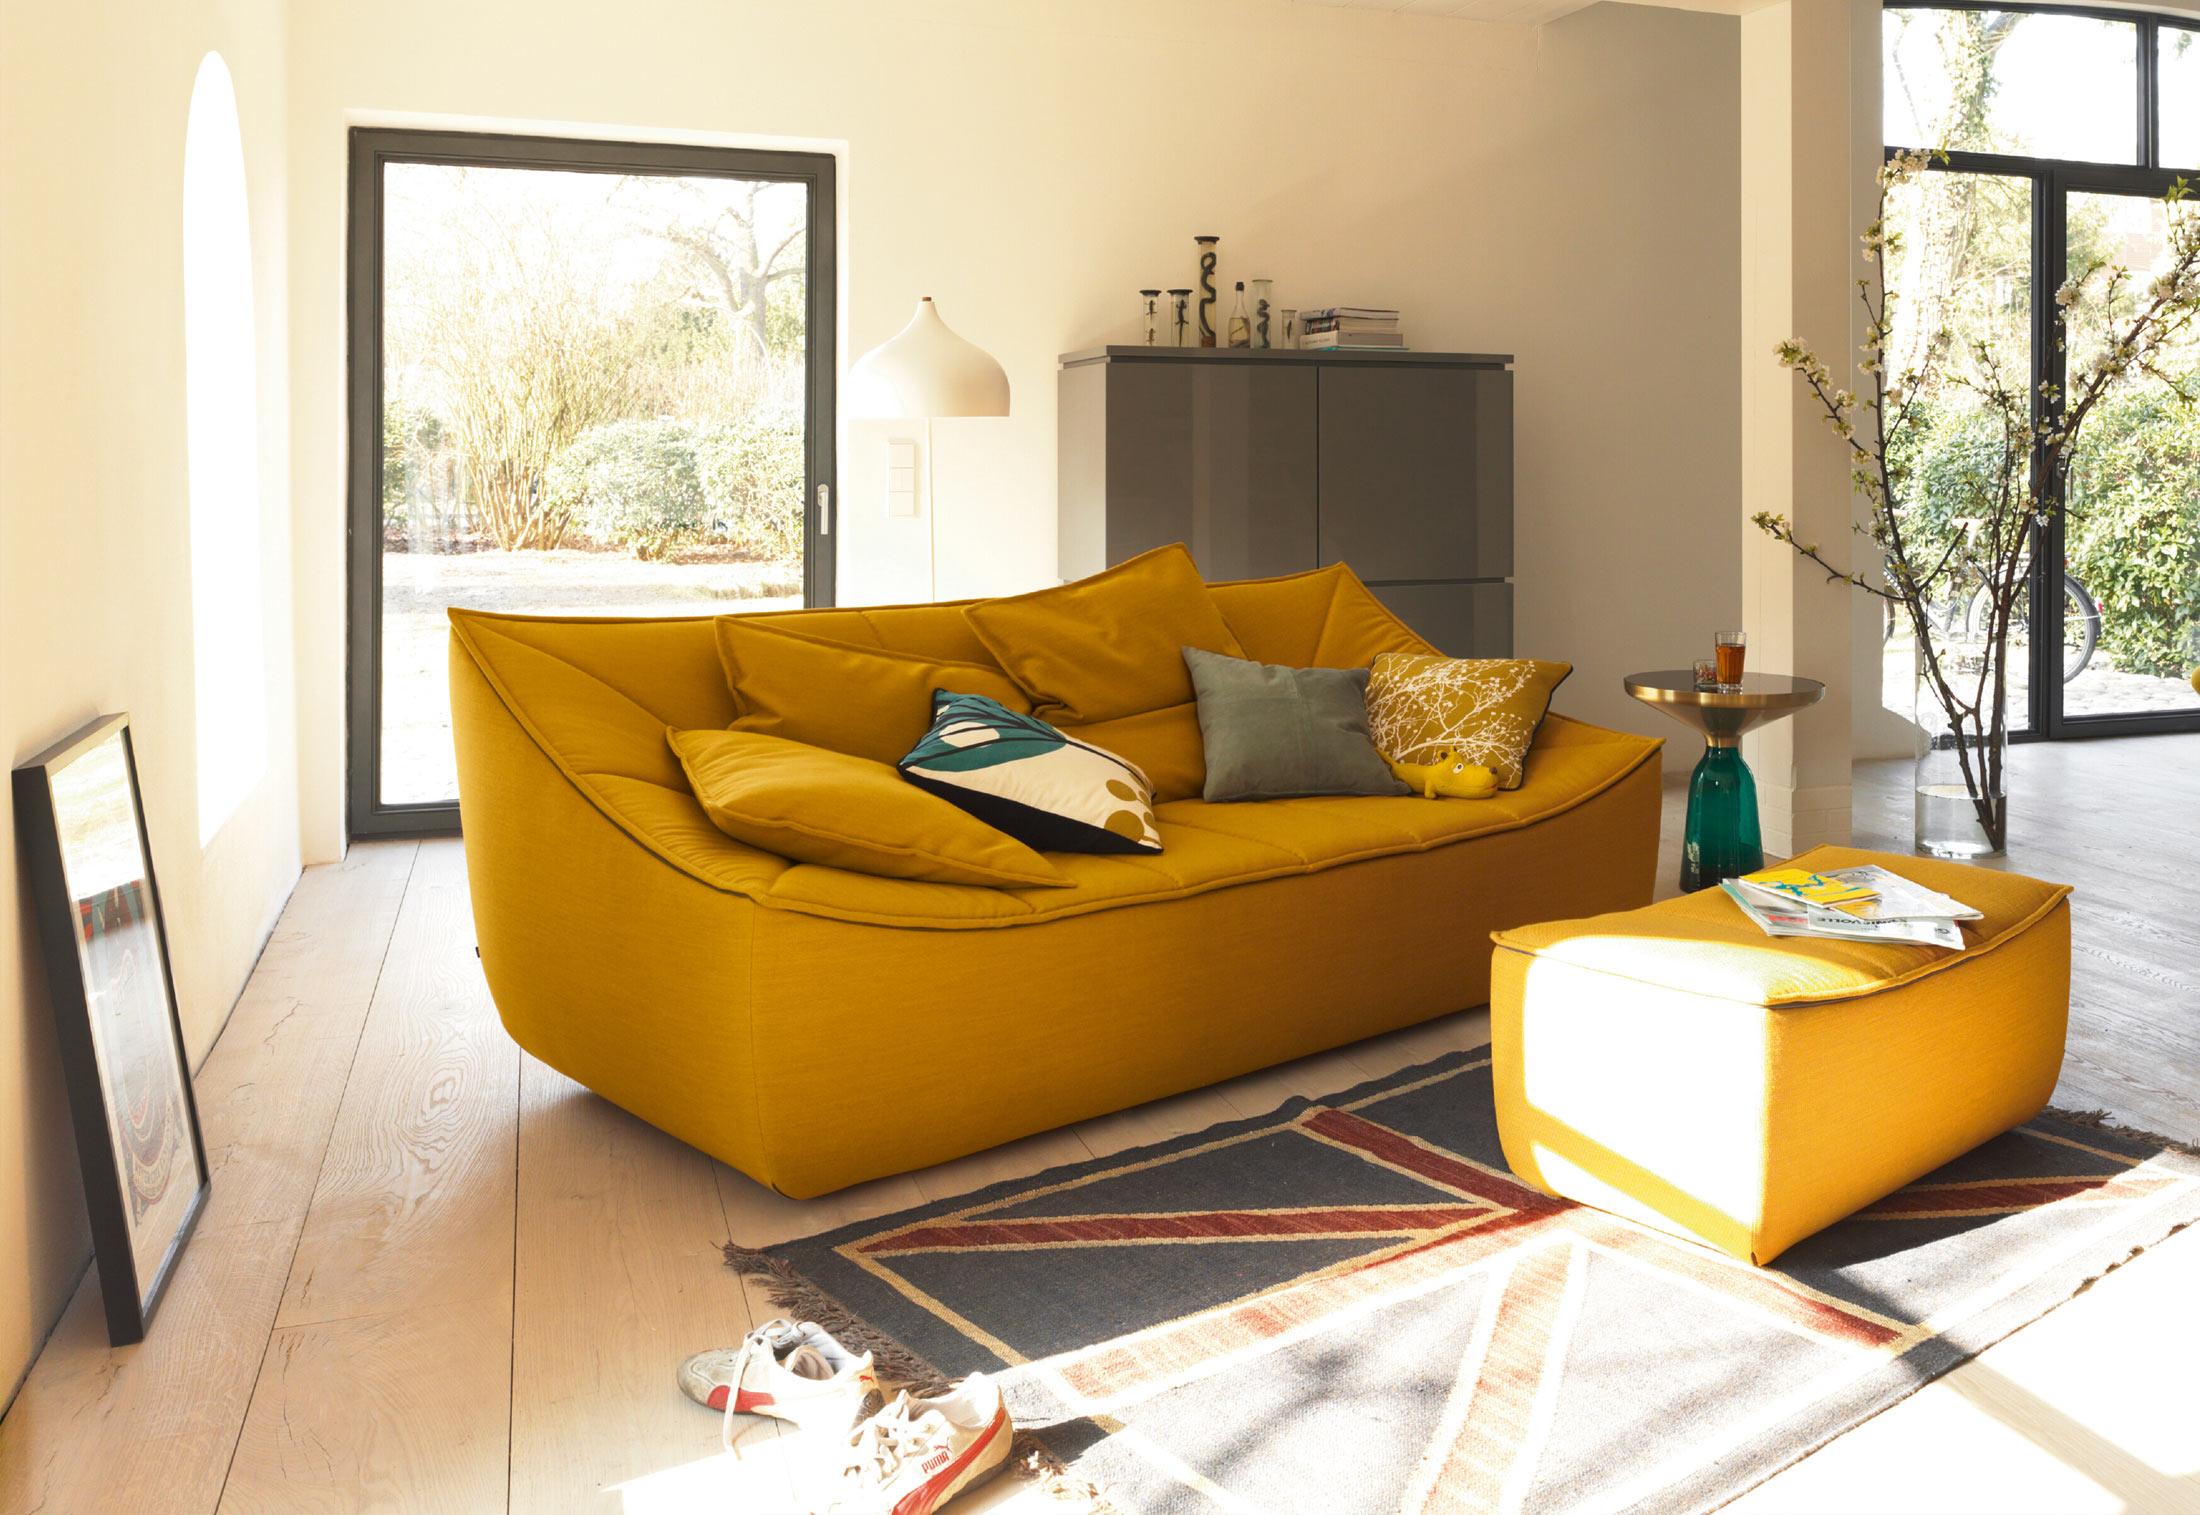 Bahir sofa by j rg boner for cor sohomod blog for Sofa vor heizung